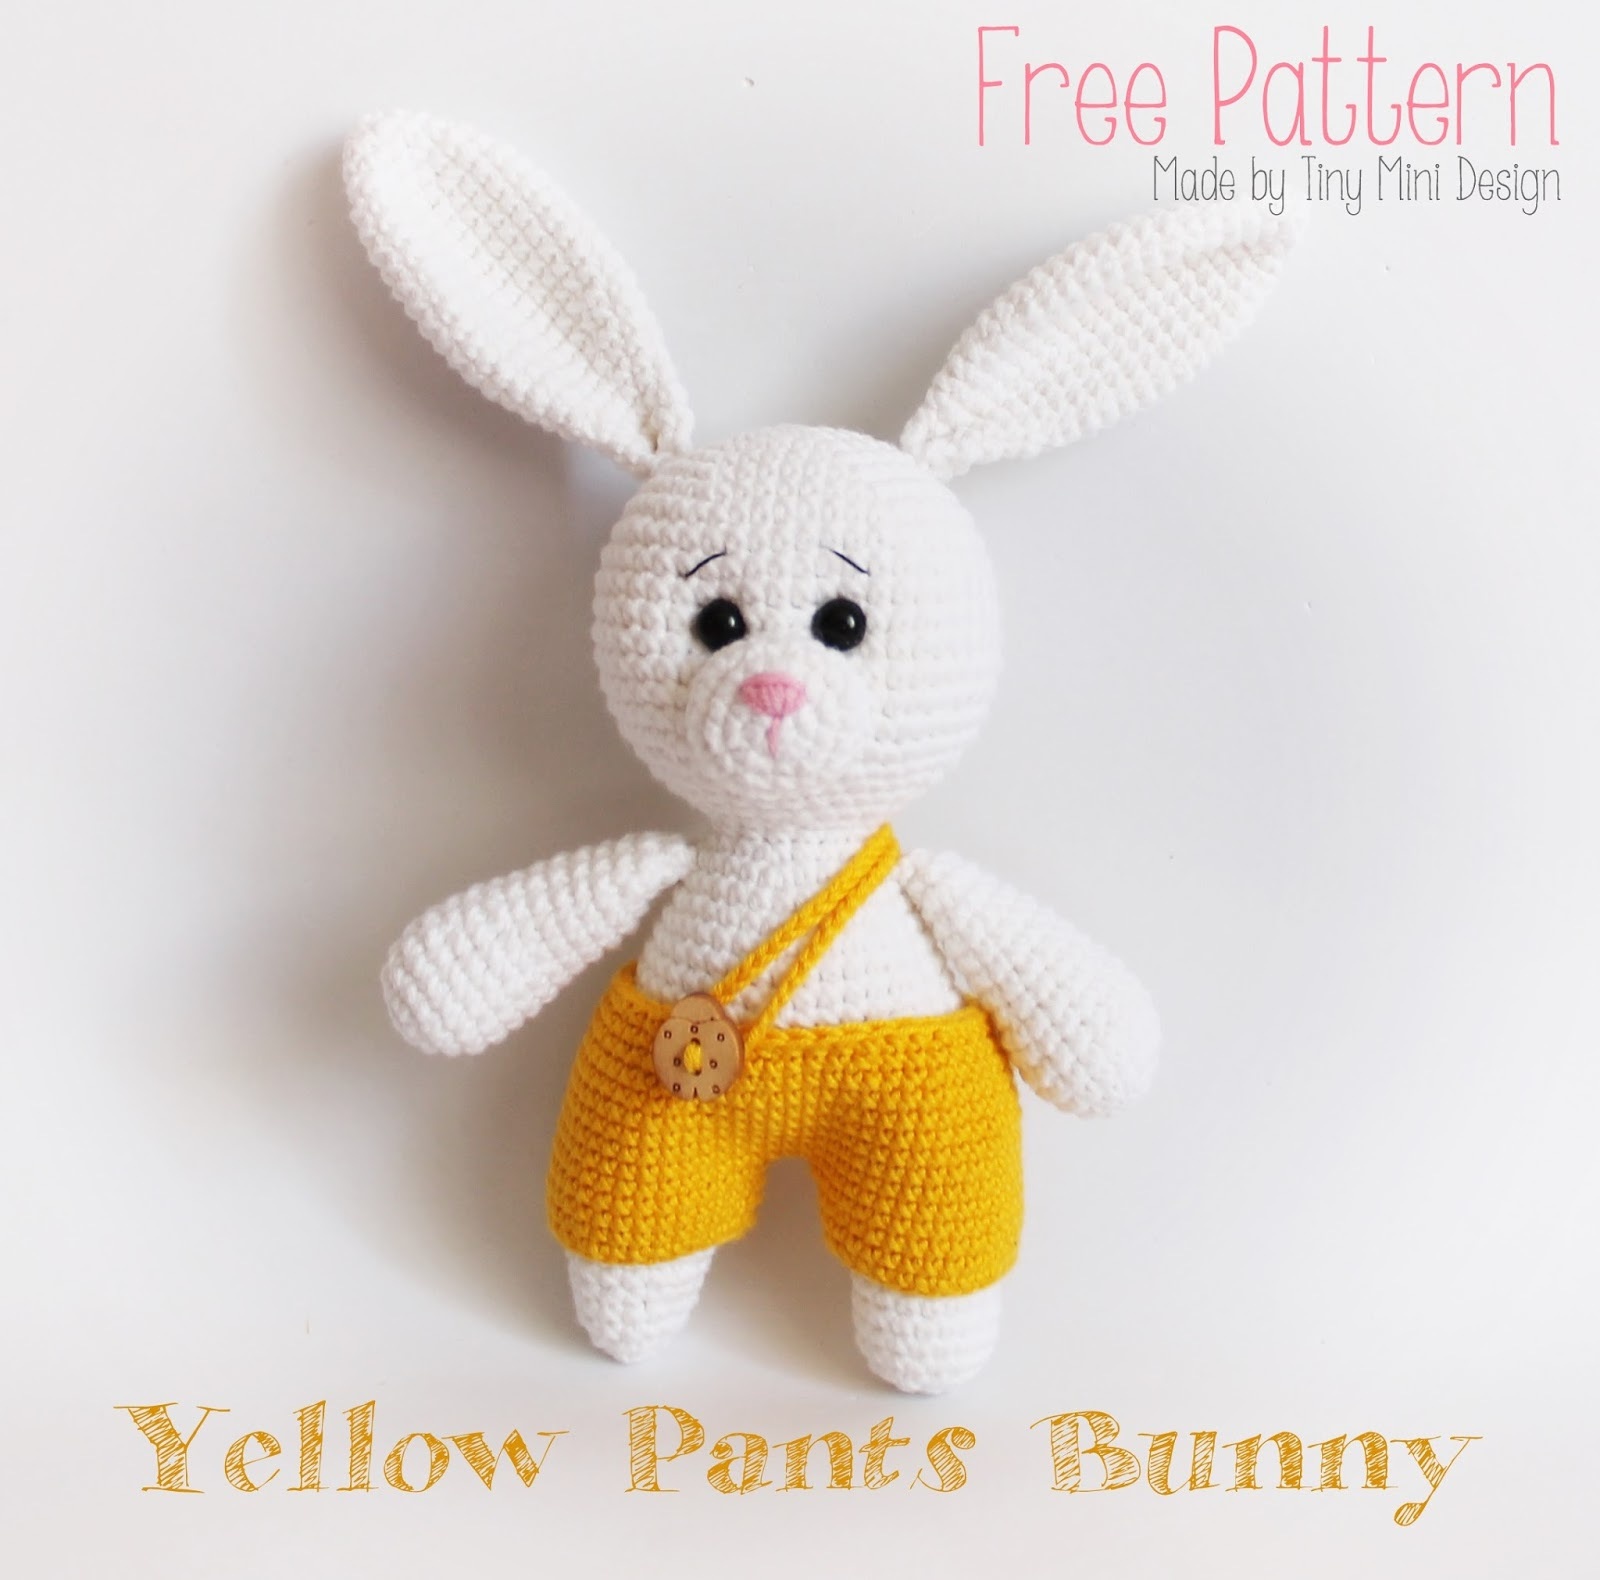 Amigurumi How To Change Color : Amigurumi Yellow Pants Bunny-Free Pattern - Amigurumi Free ...